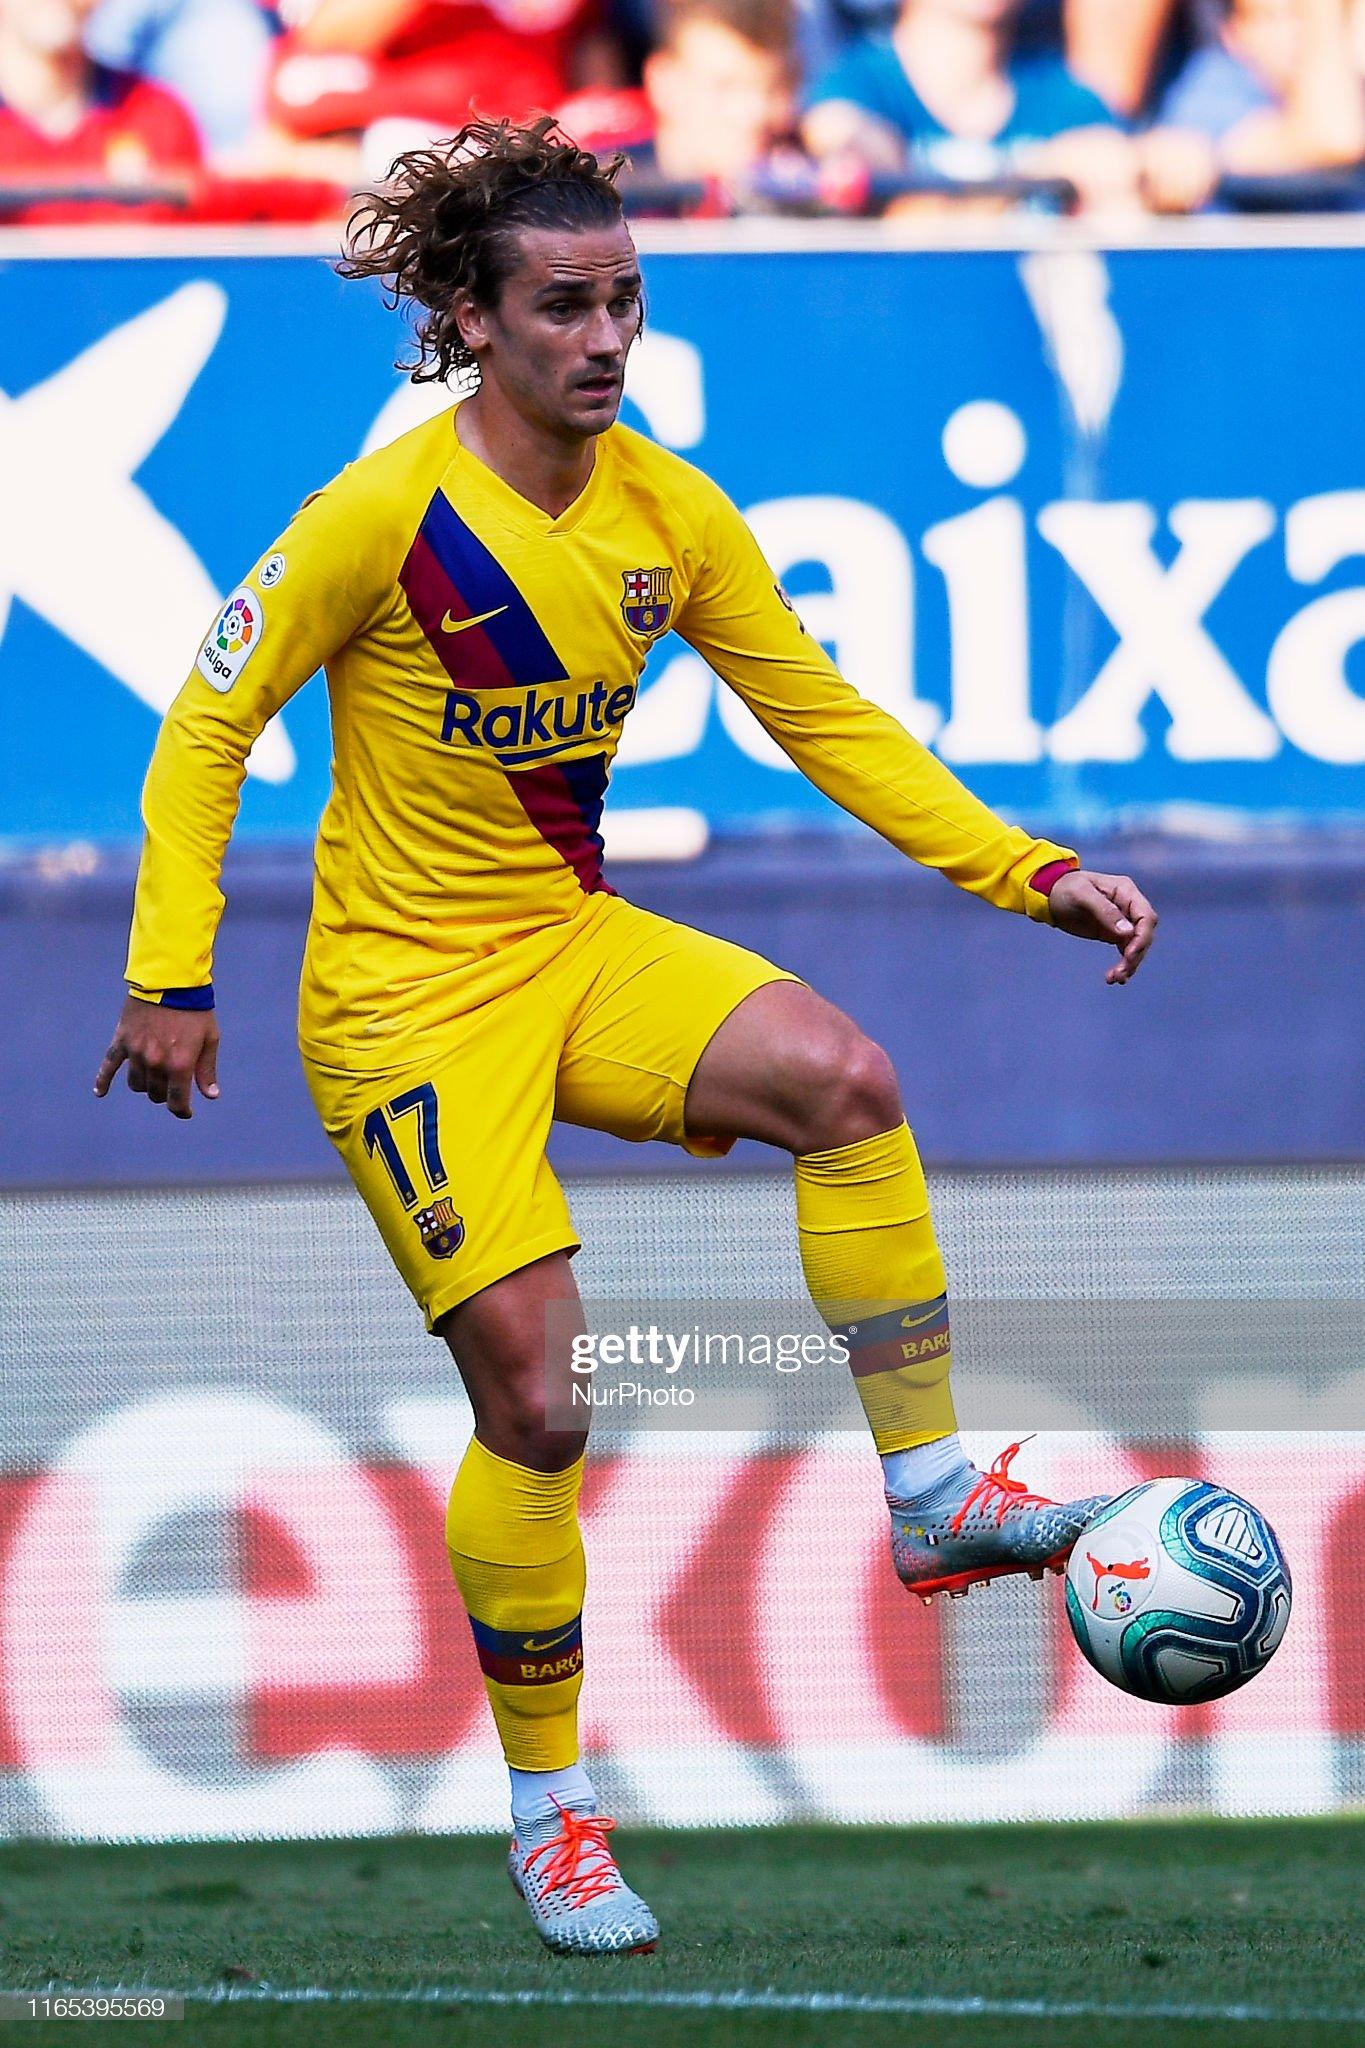 صور مباراة : أوساسونا - برشلونة 2-2 ( 31-08-2019 )  Antoine-griezmann-of-barcelona-controls-the-ball-during-the-liga-ca-picture-id1165395569?s=2048x2048